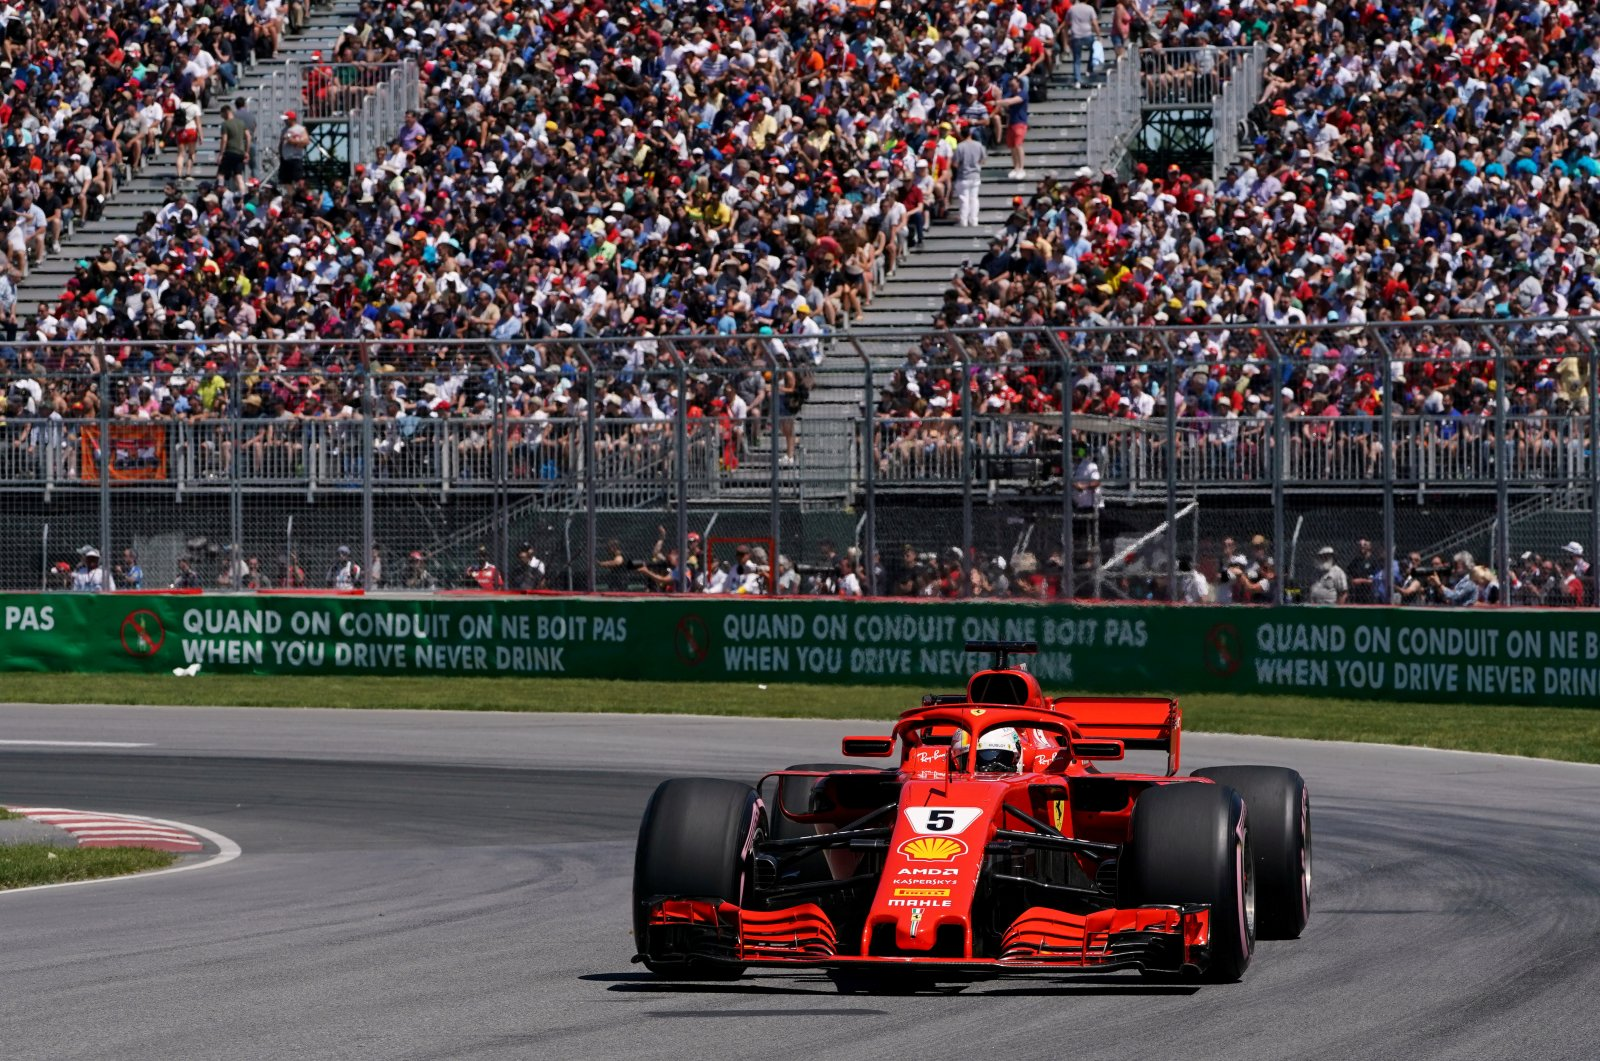 Ferrari's Sebastian Vettel in action during Canda Grand Prix qualifying, Montreal, June 9, 2018. (Reuters Photo)